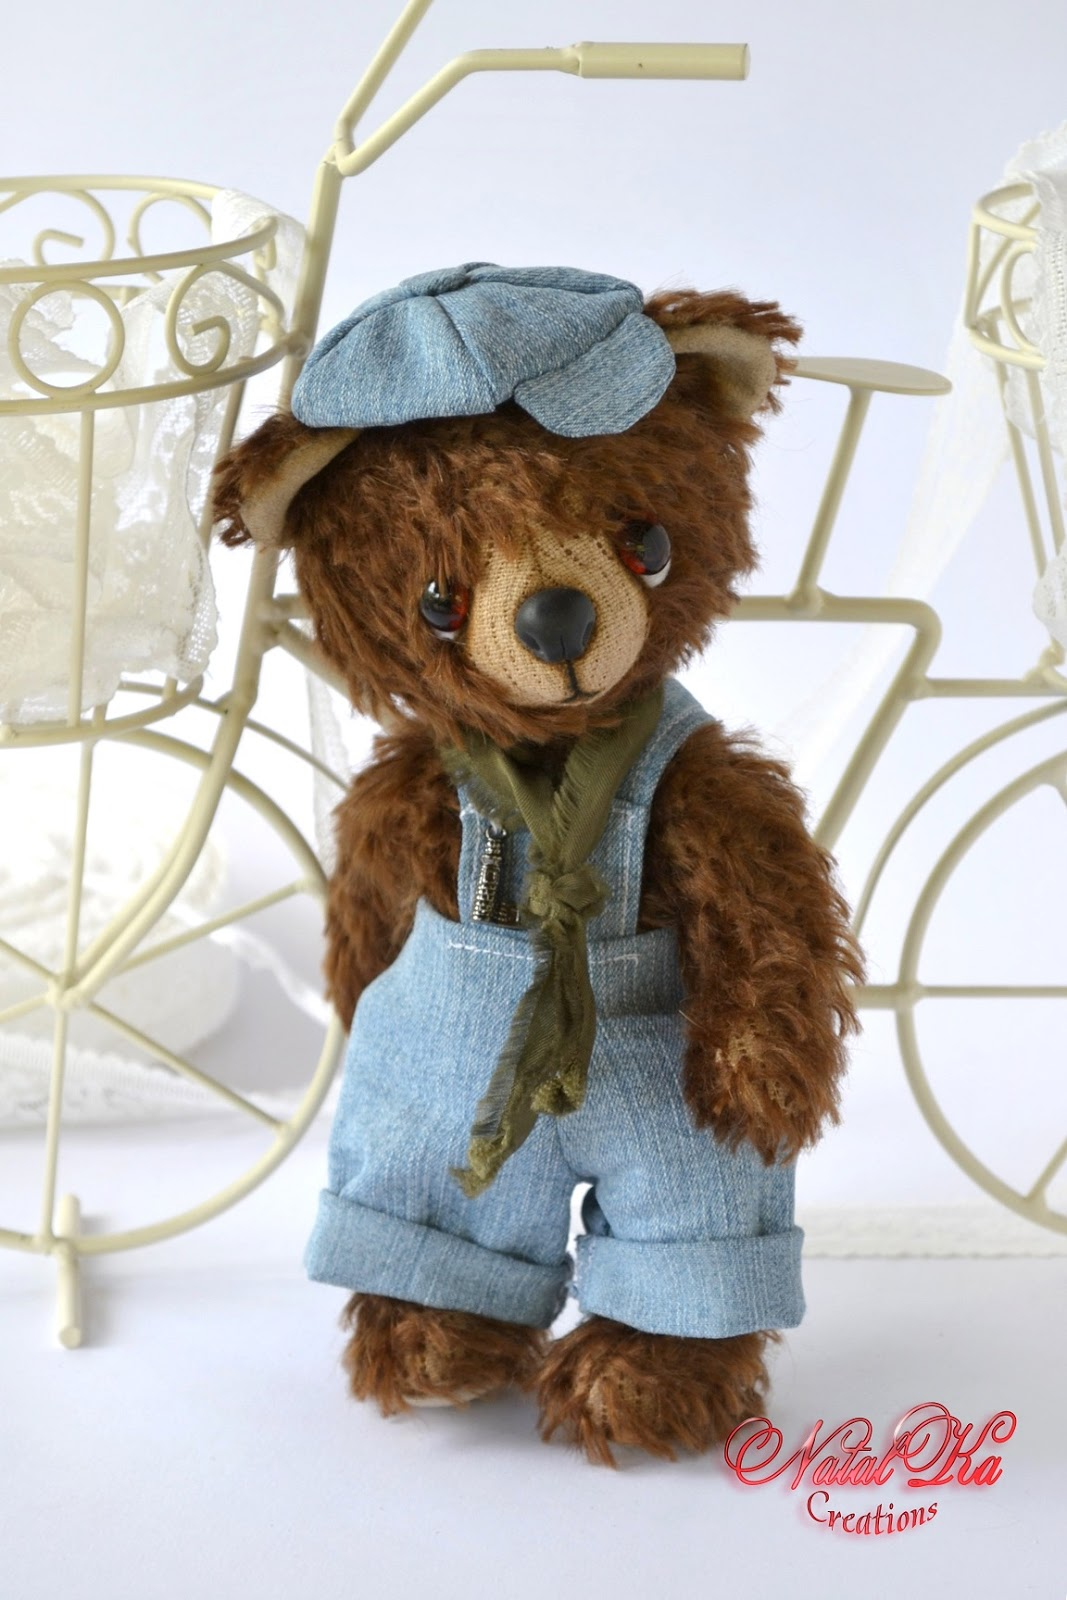 Artist teddy bear ooak handmade from mohair by NatalKa Creations. Künstlerbär Unikat handgemacht von NatalKa Creations.